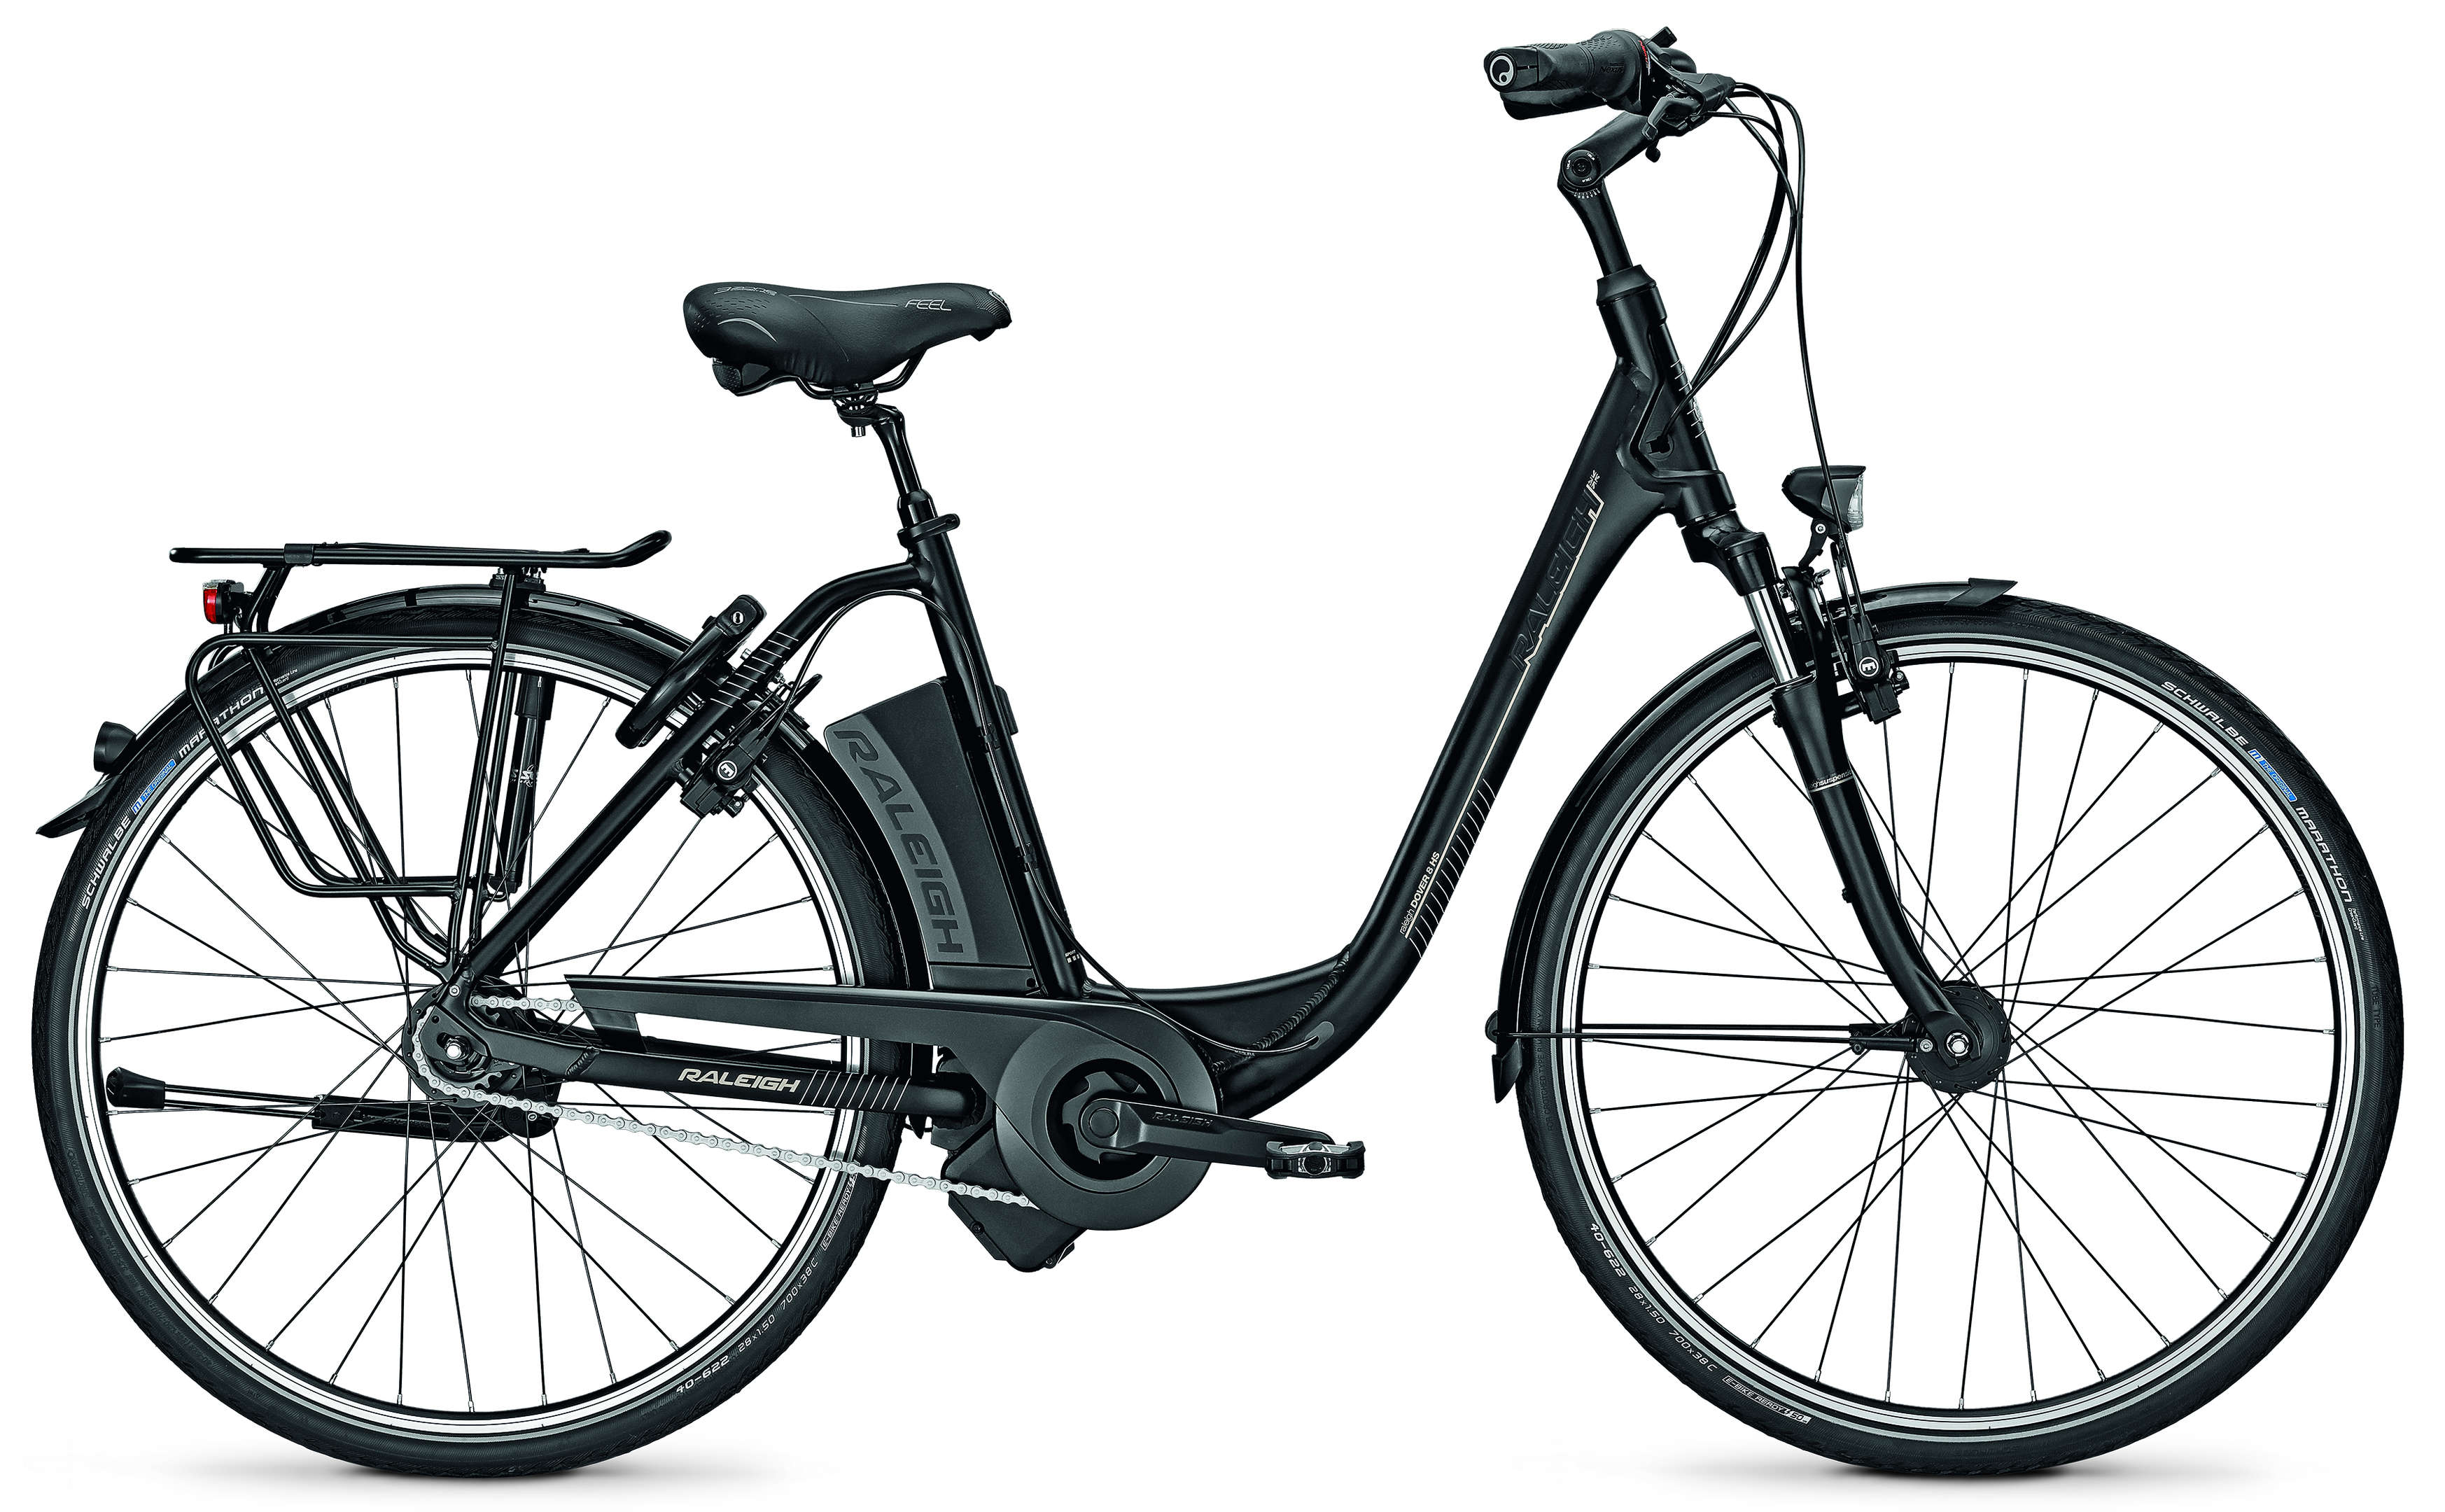 raleigh e bike dover impulse 8r hs eurorad bikeleasingeurorad bikeleasing. Black Bedroom Furniture Sets. Home Design Ideas